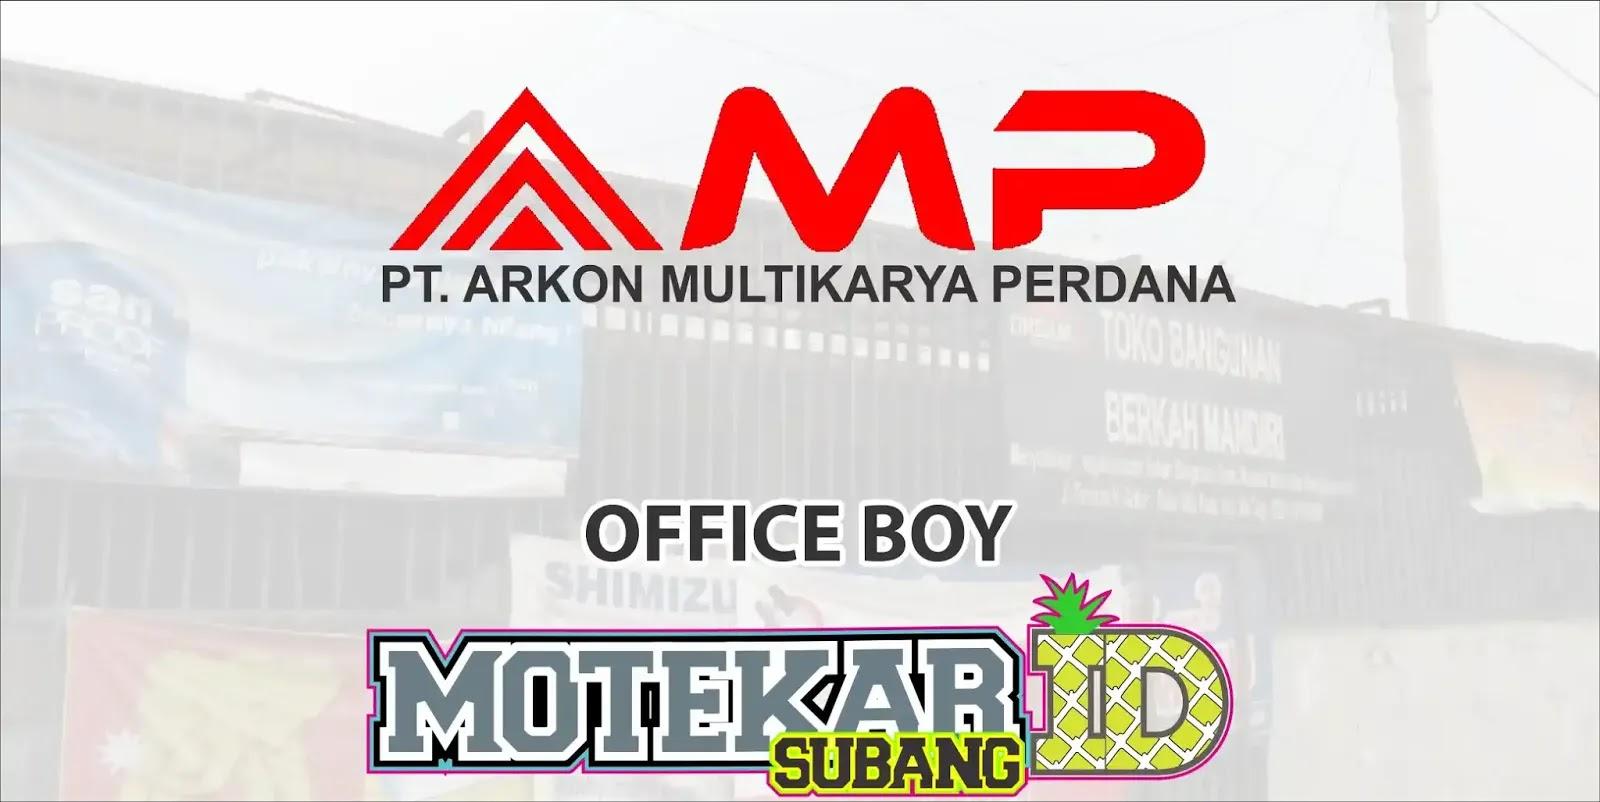 Lowonga Kerja Office Boy Pt Arkon Multikarya Perdana